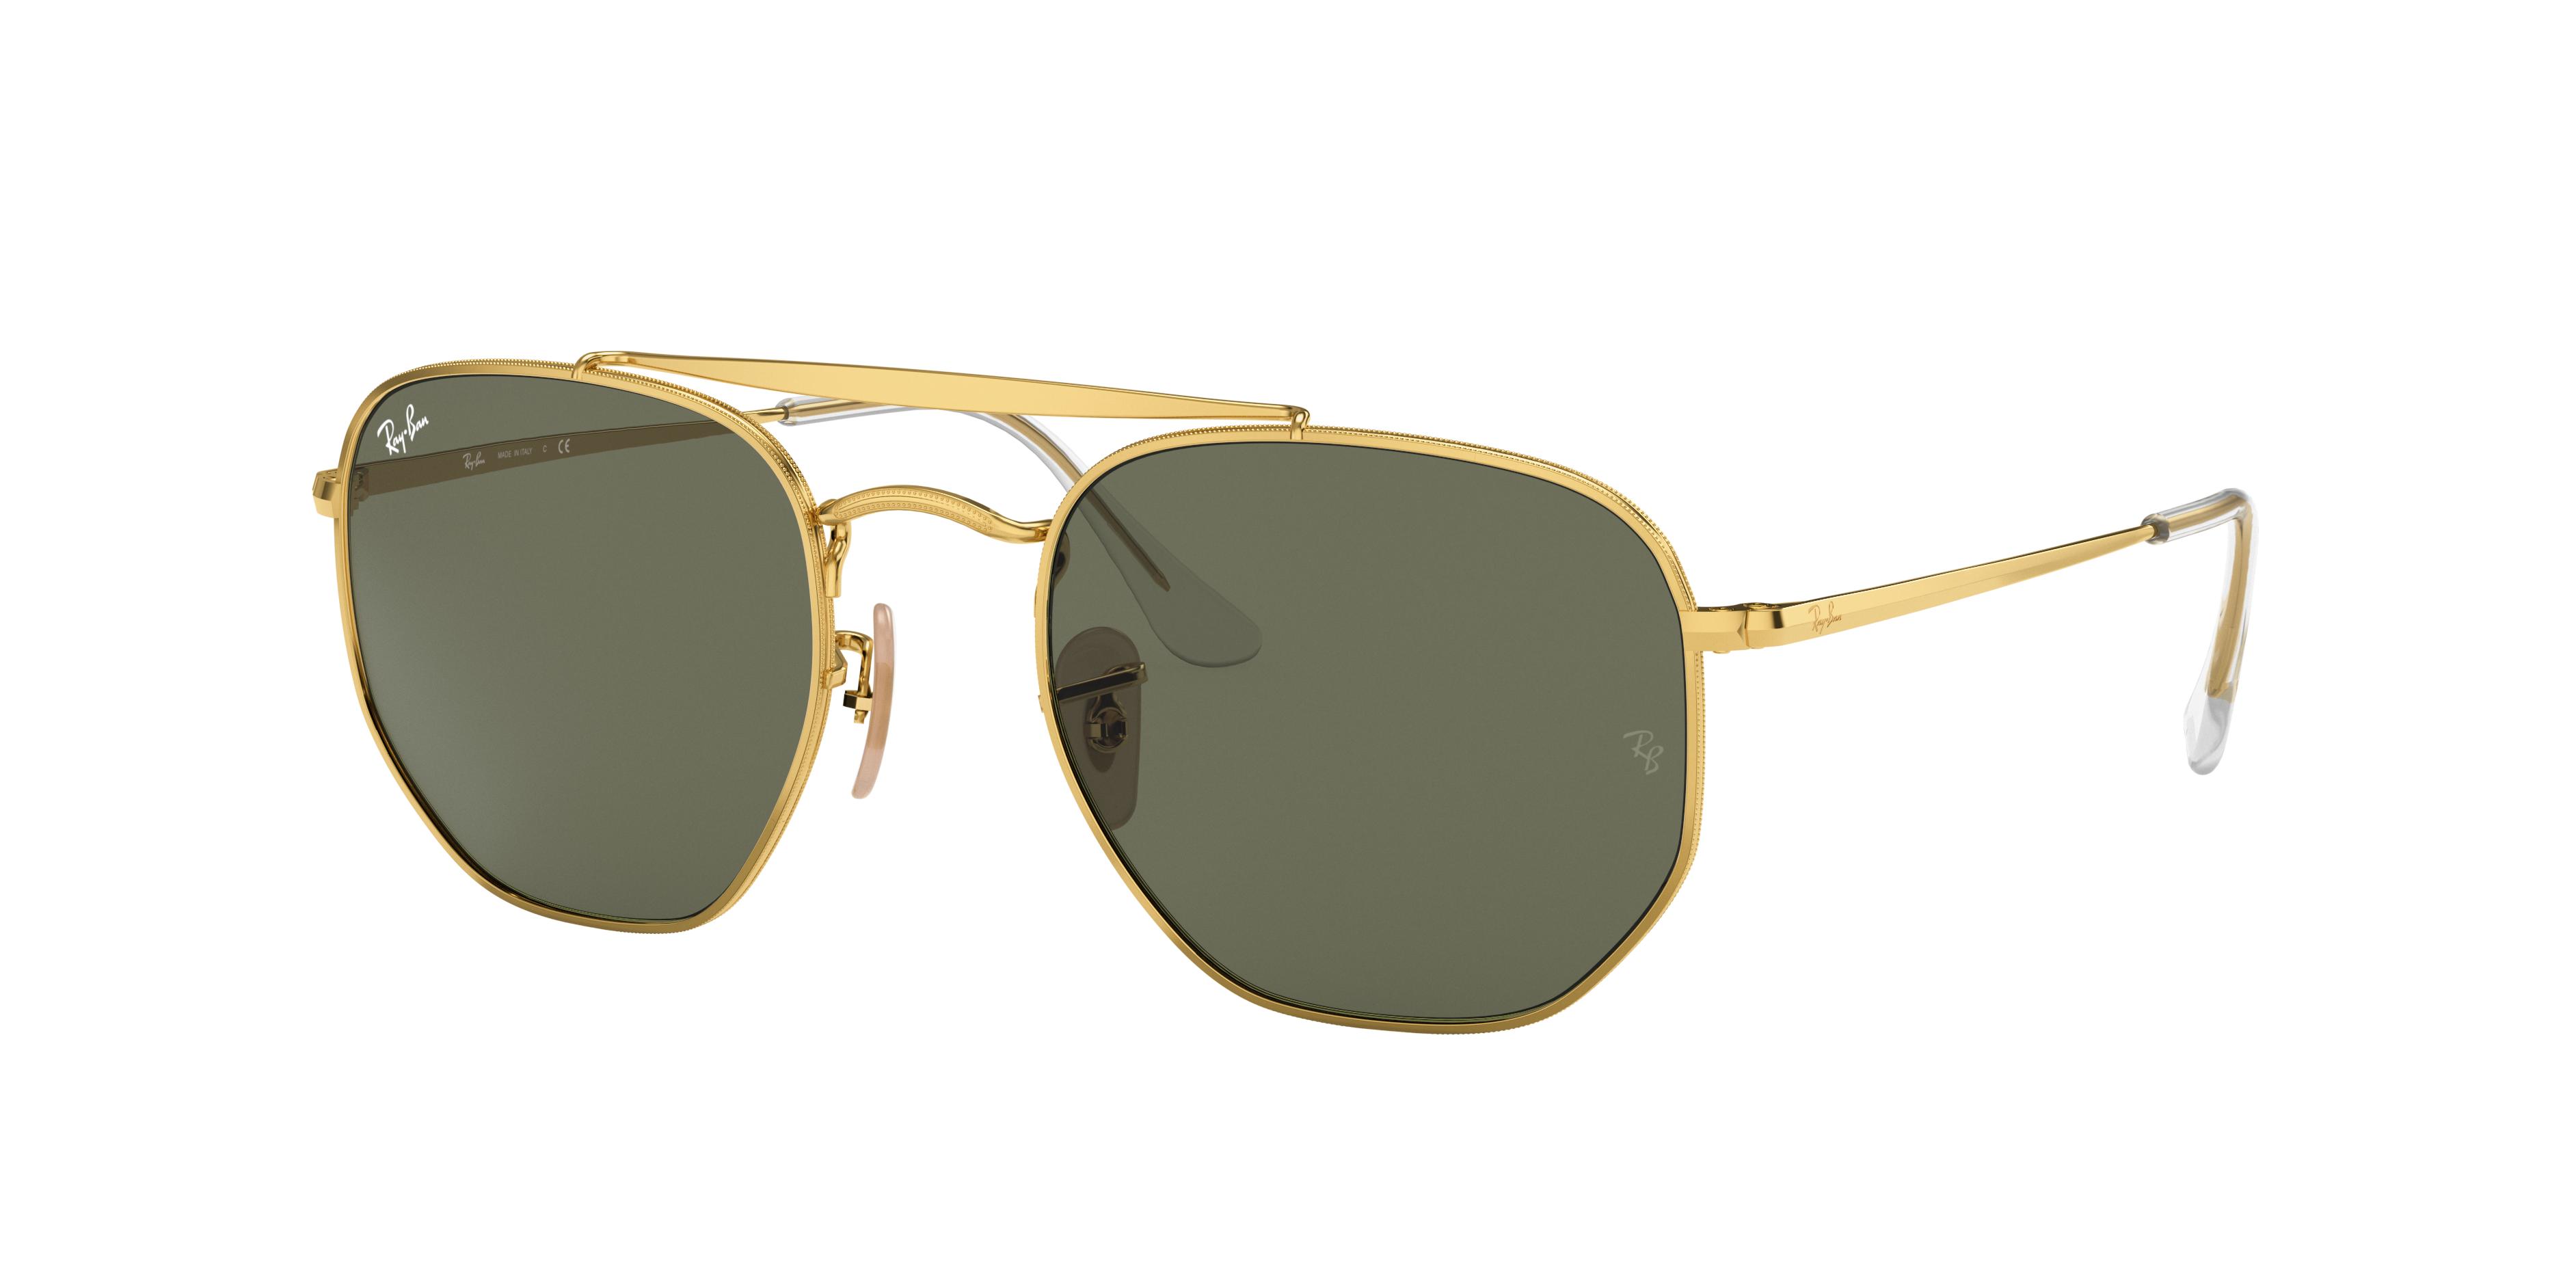 Ray-Ban Marshal Gold, Green Lenses - RB3648